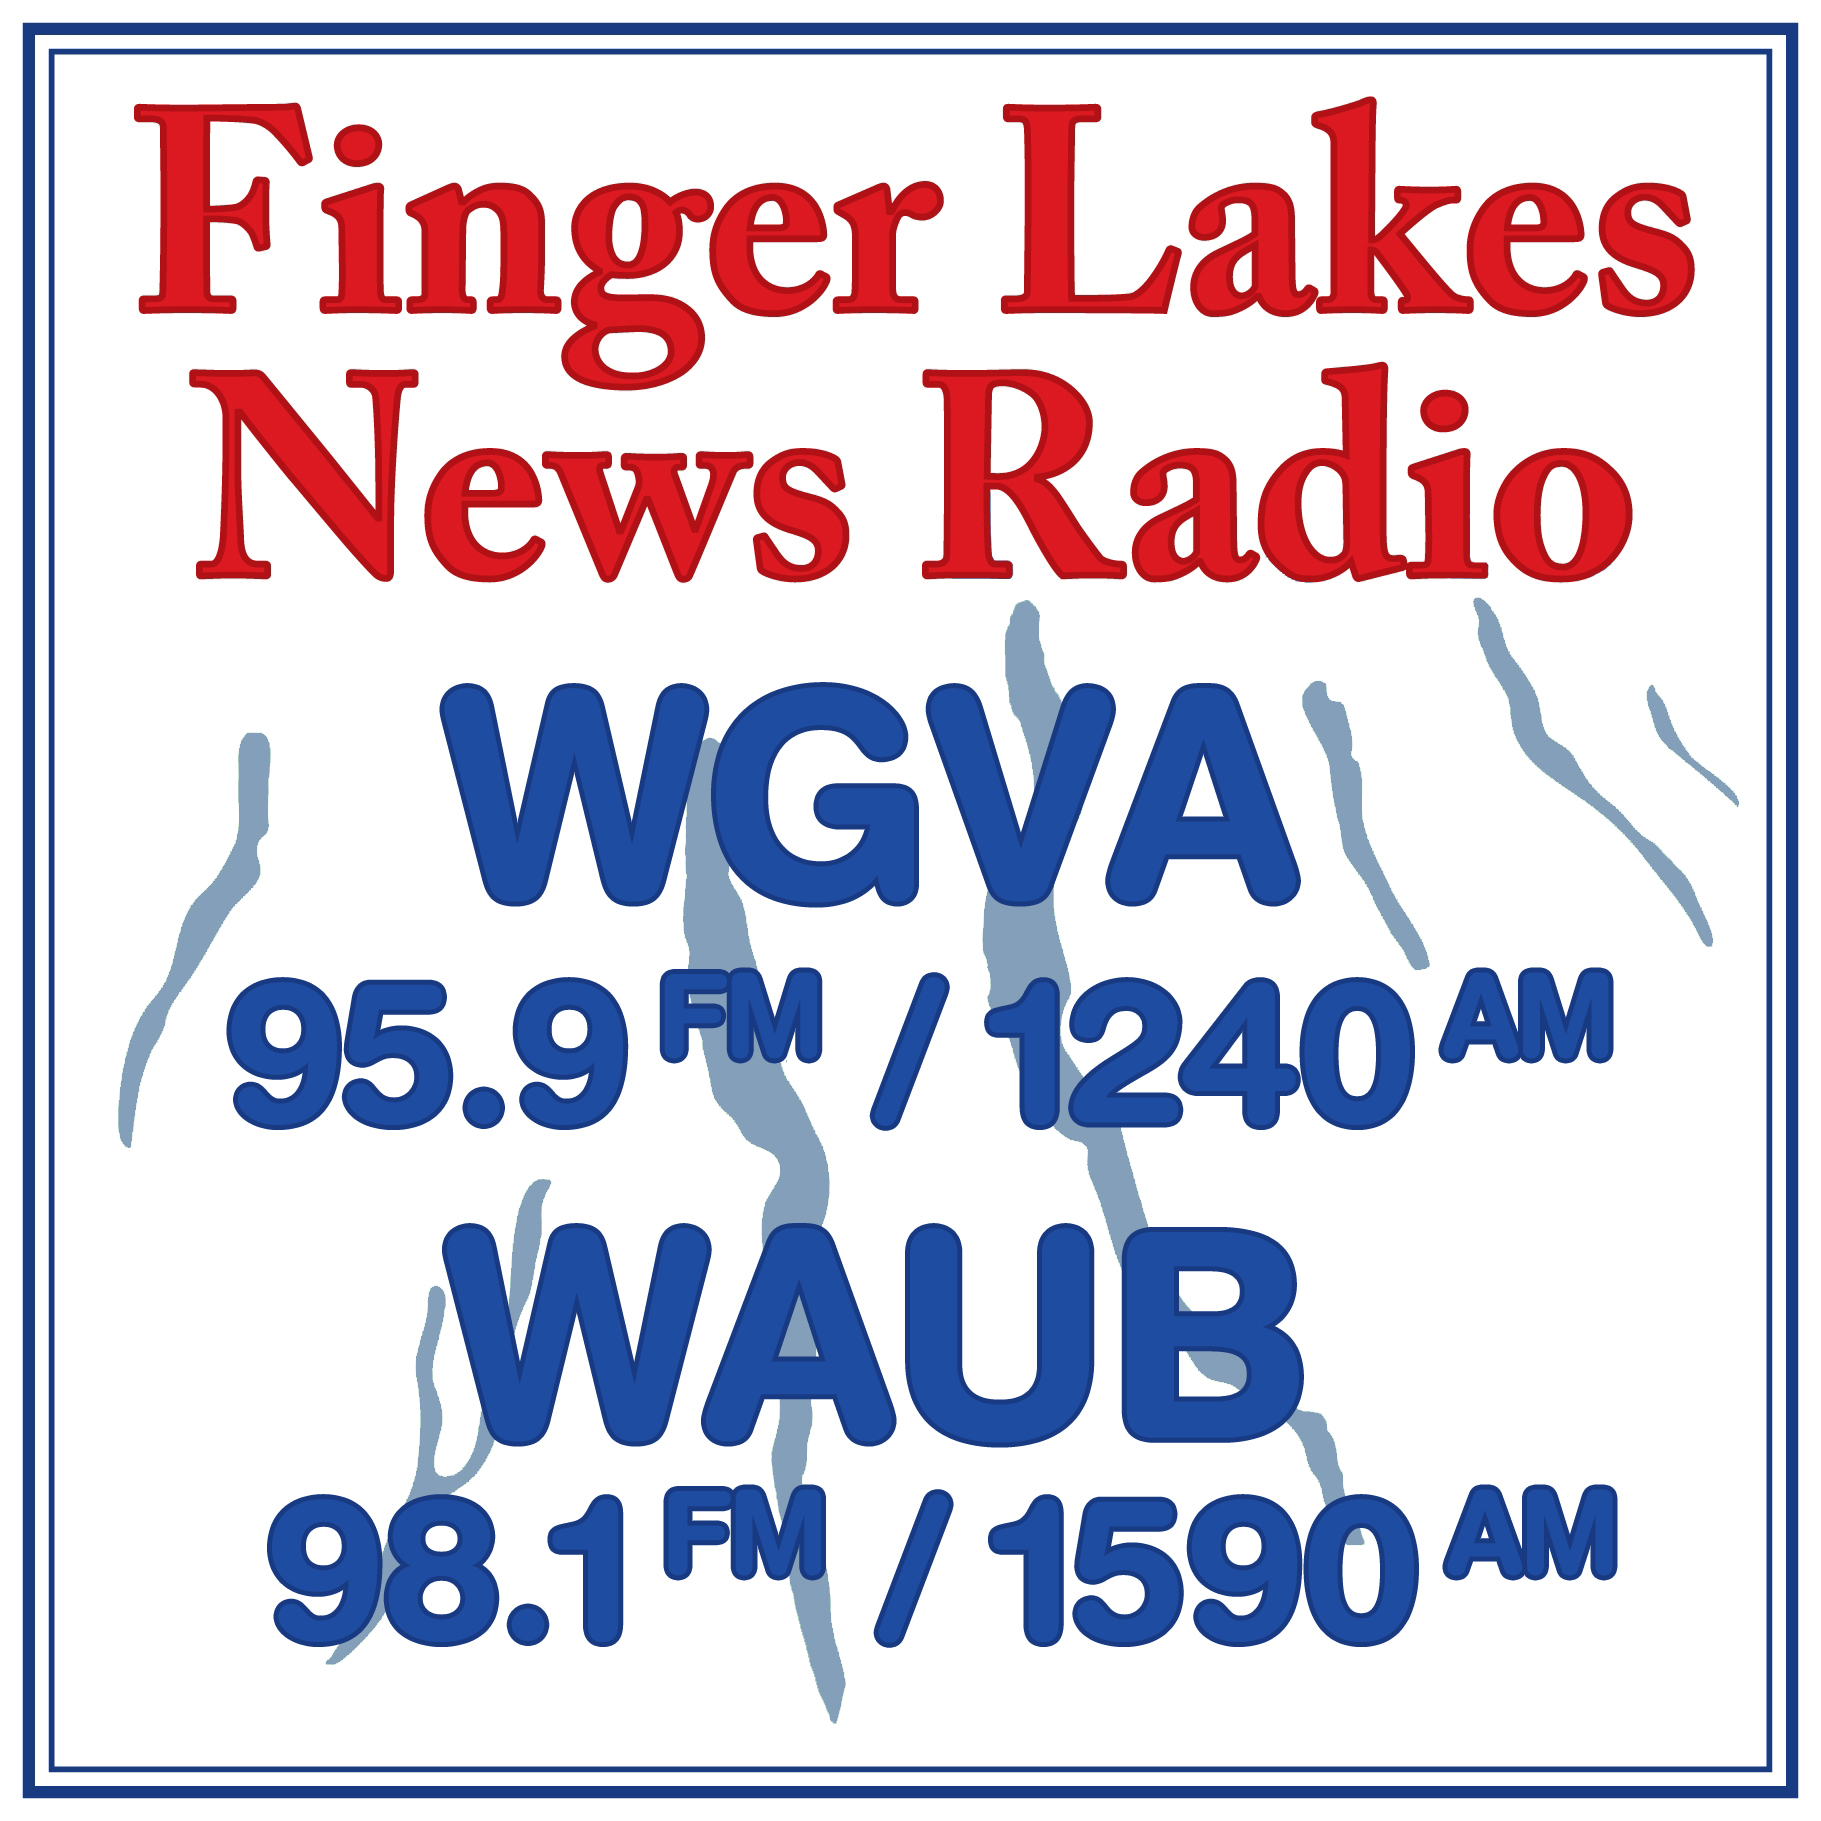 wgva-waub-combined-logo